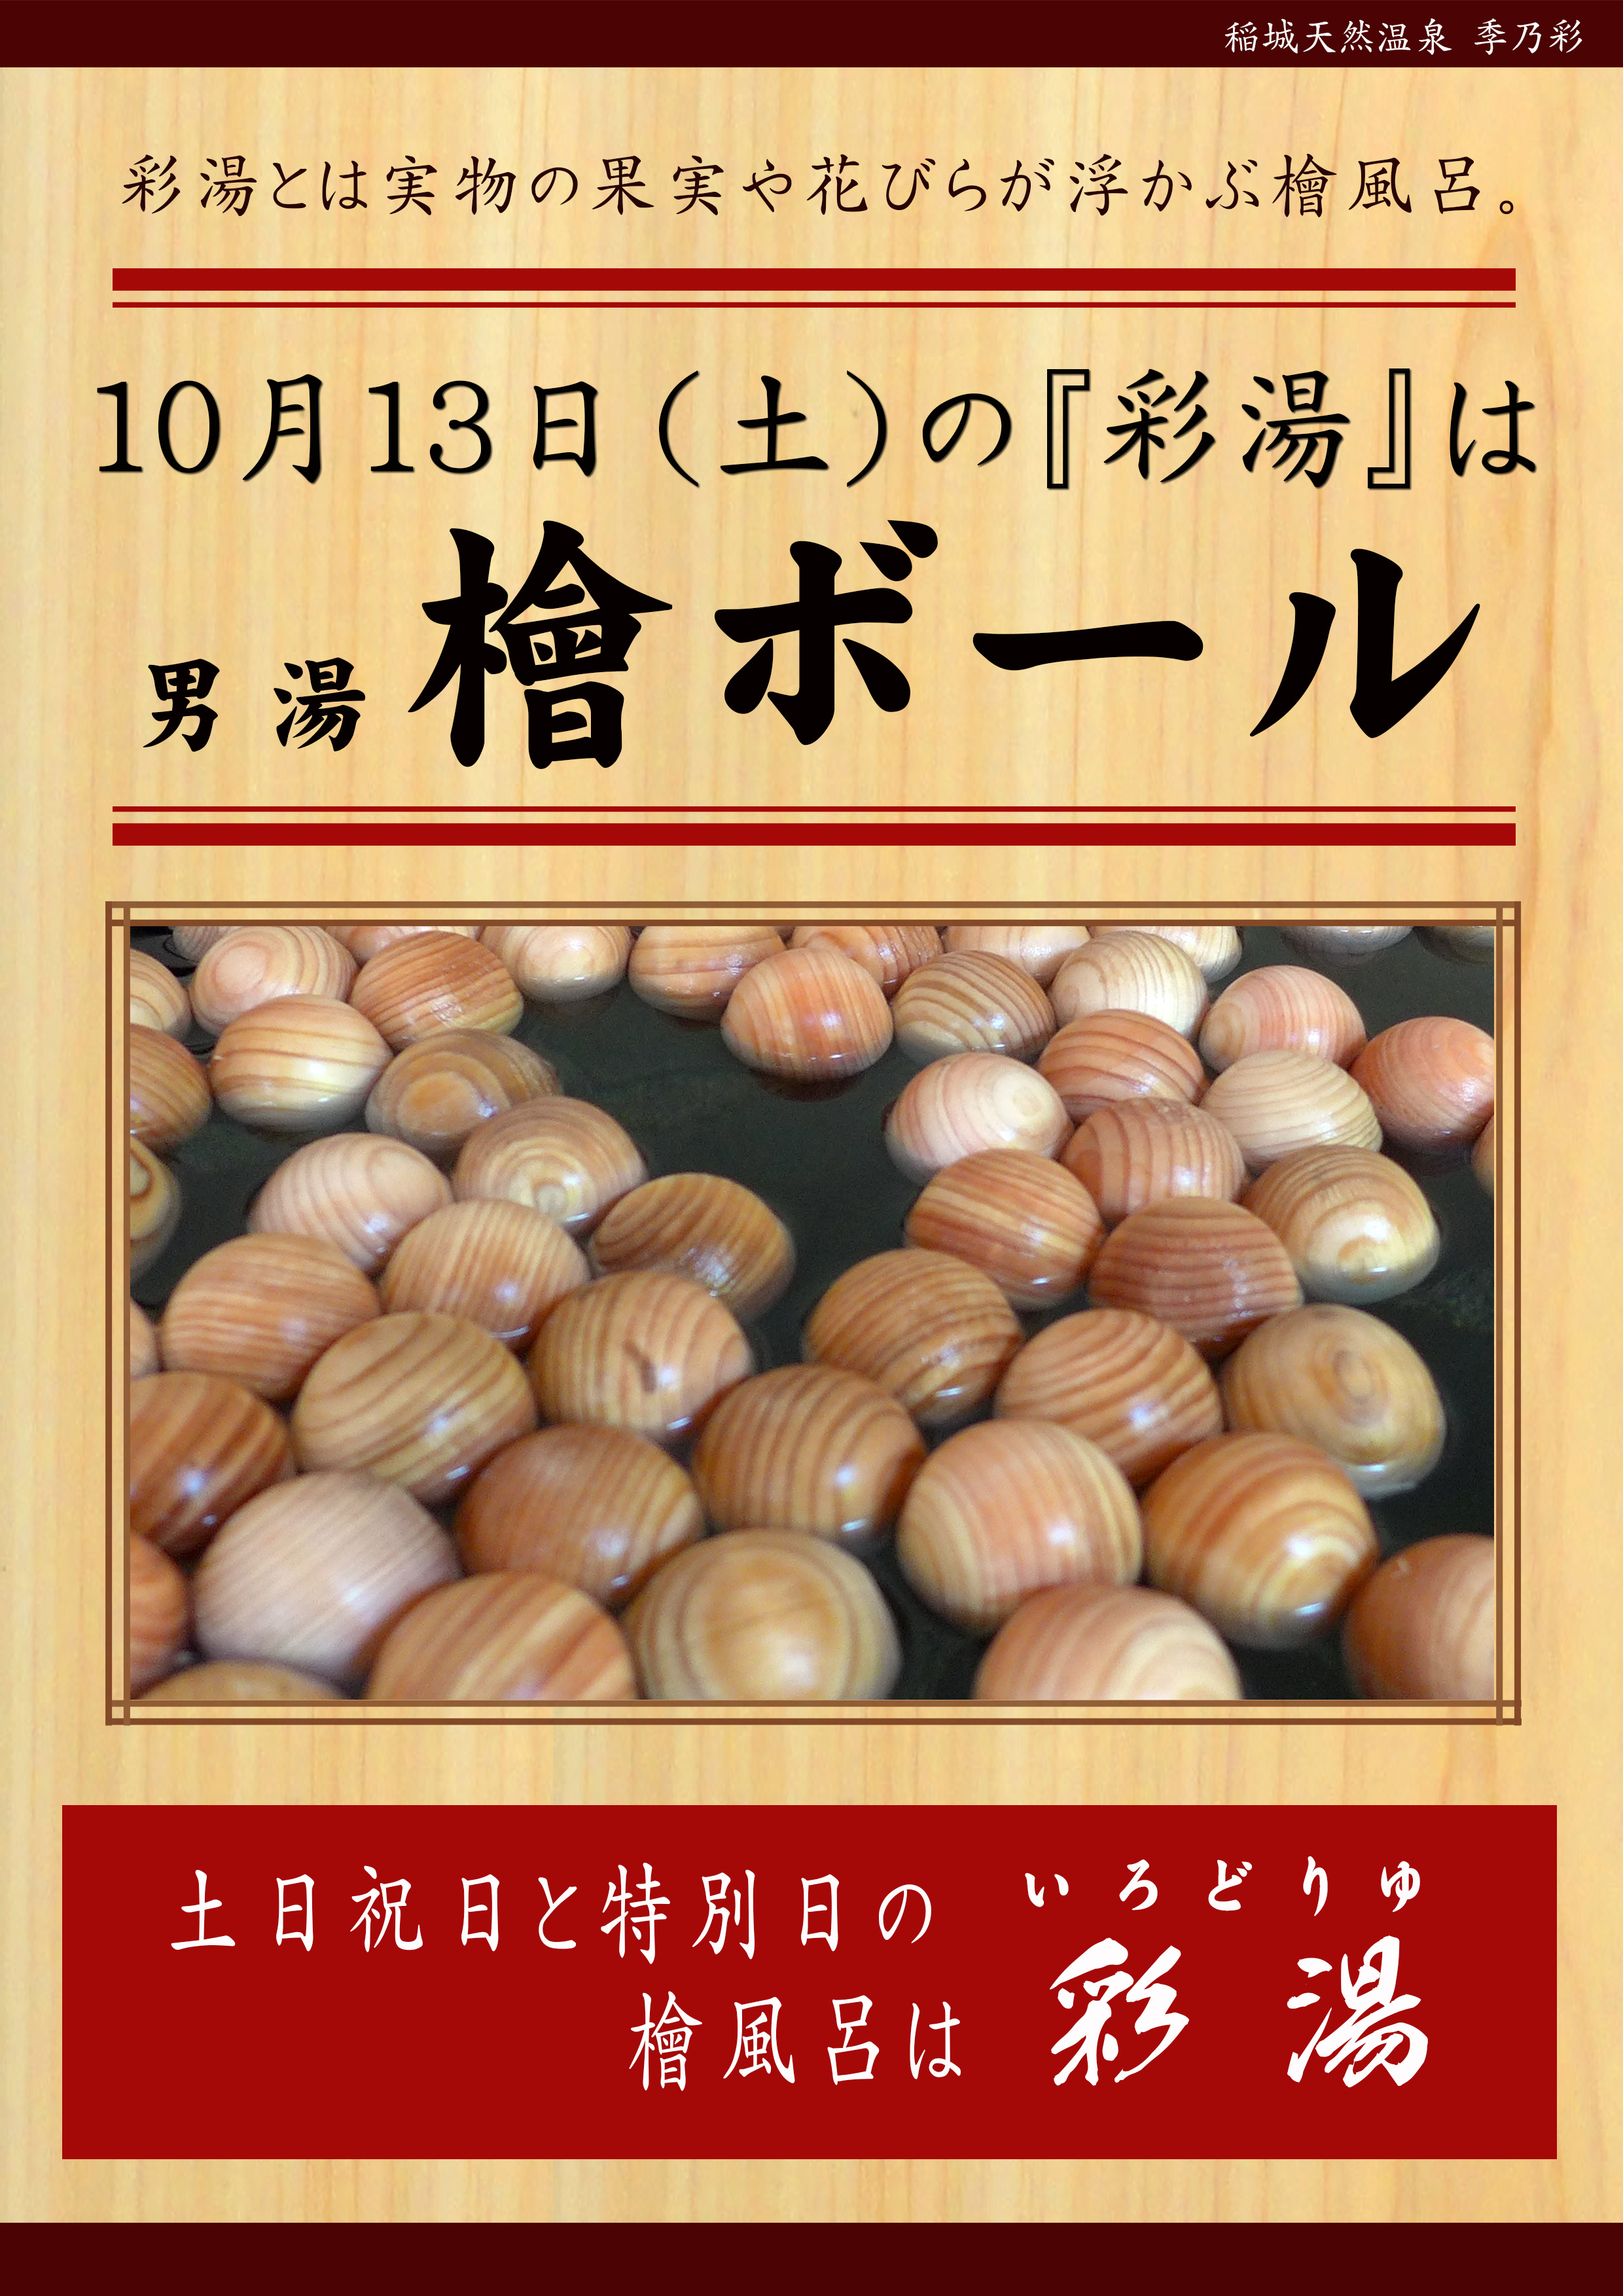 20181013POP イベント 彩湯 男湯 檜ボール